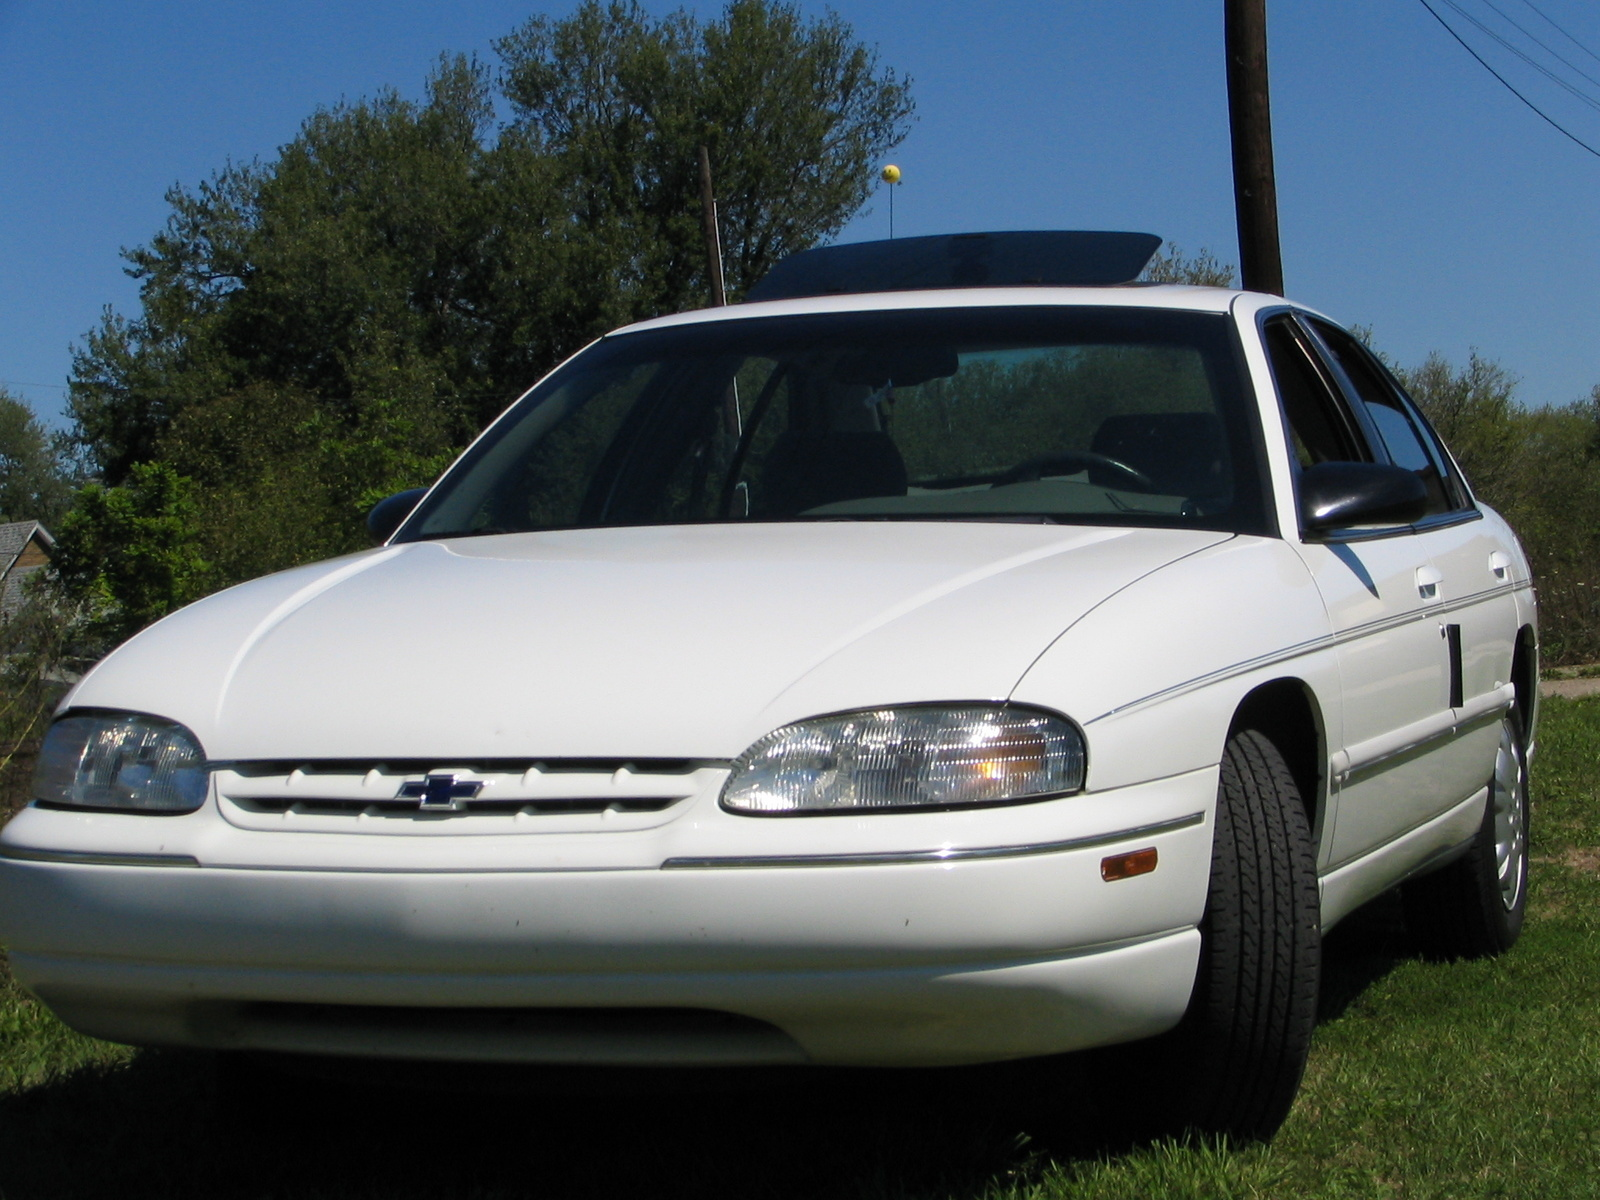 1999 Chevrolet Lumina - Overview